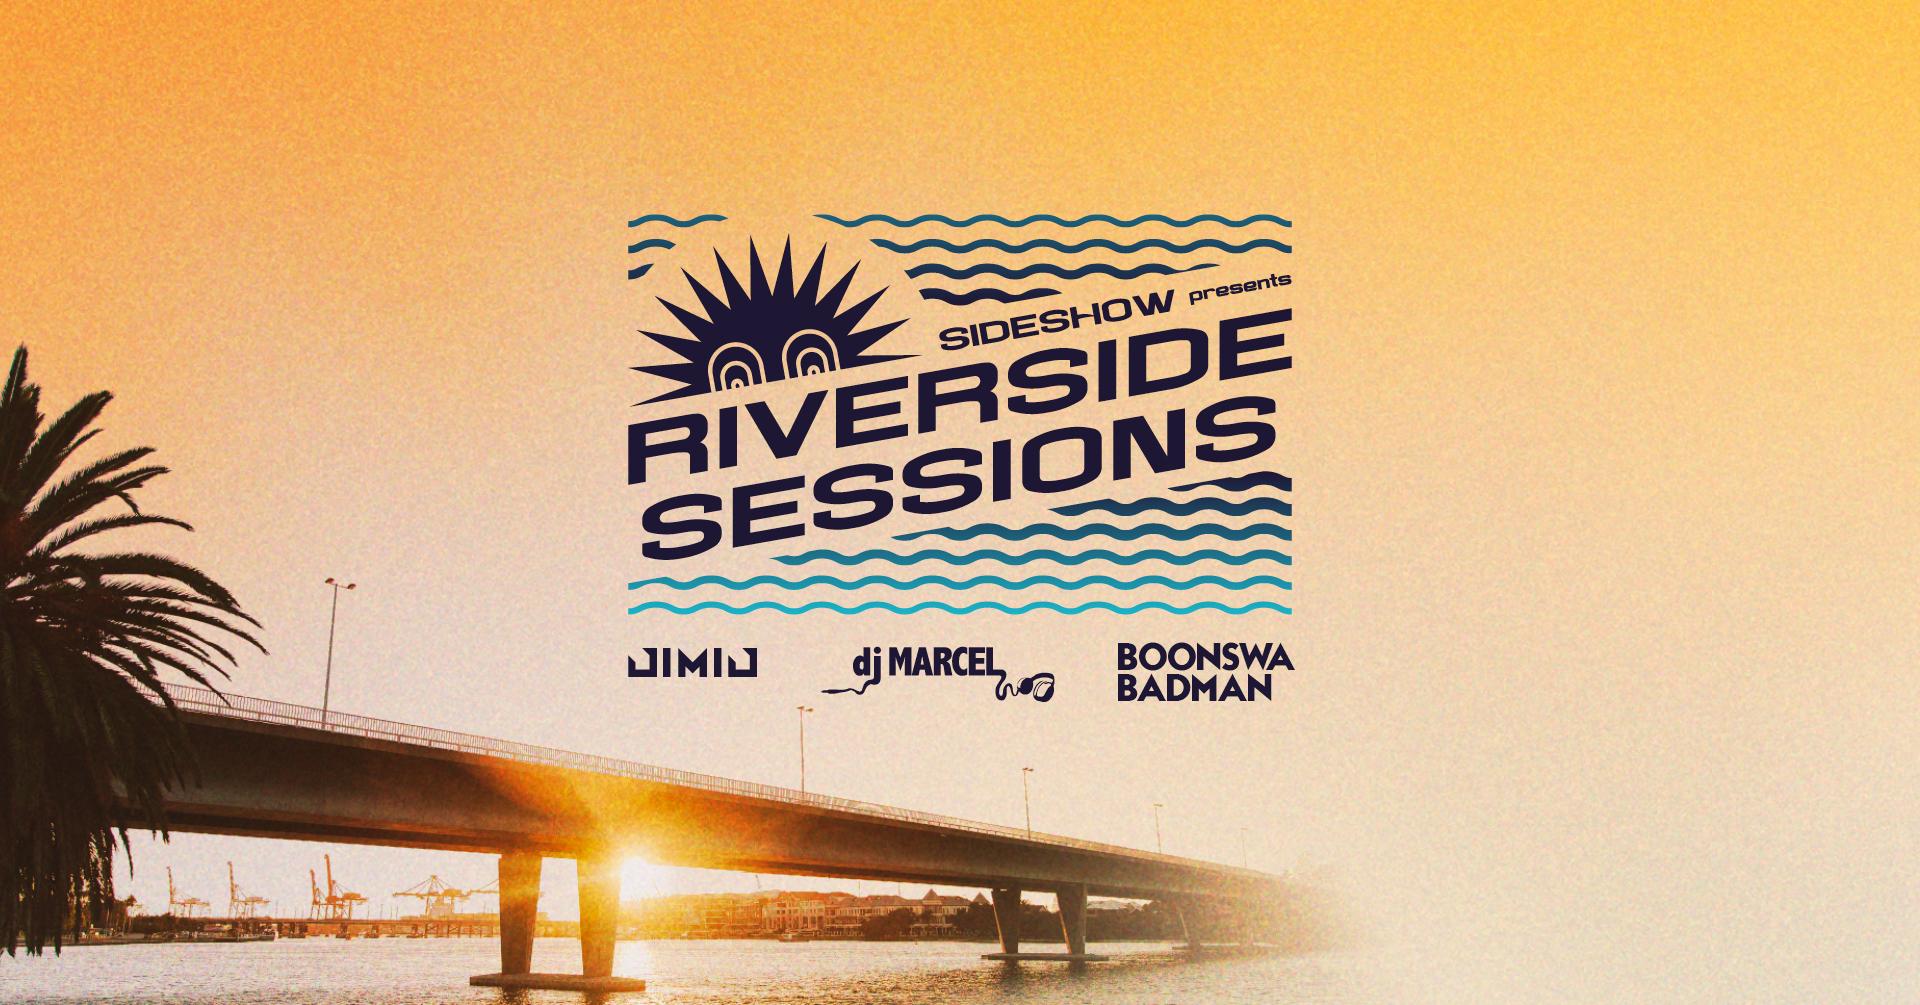 Sideshow Perth - Riverside Session Anzac Day 2021